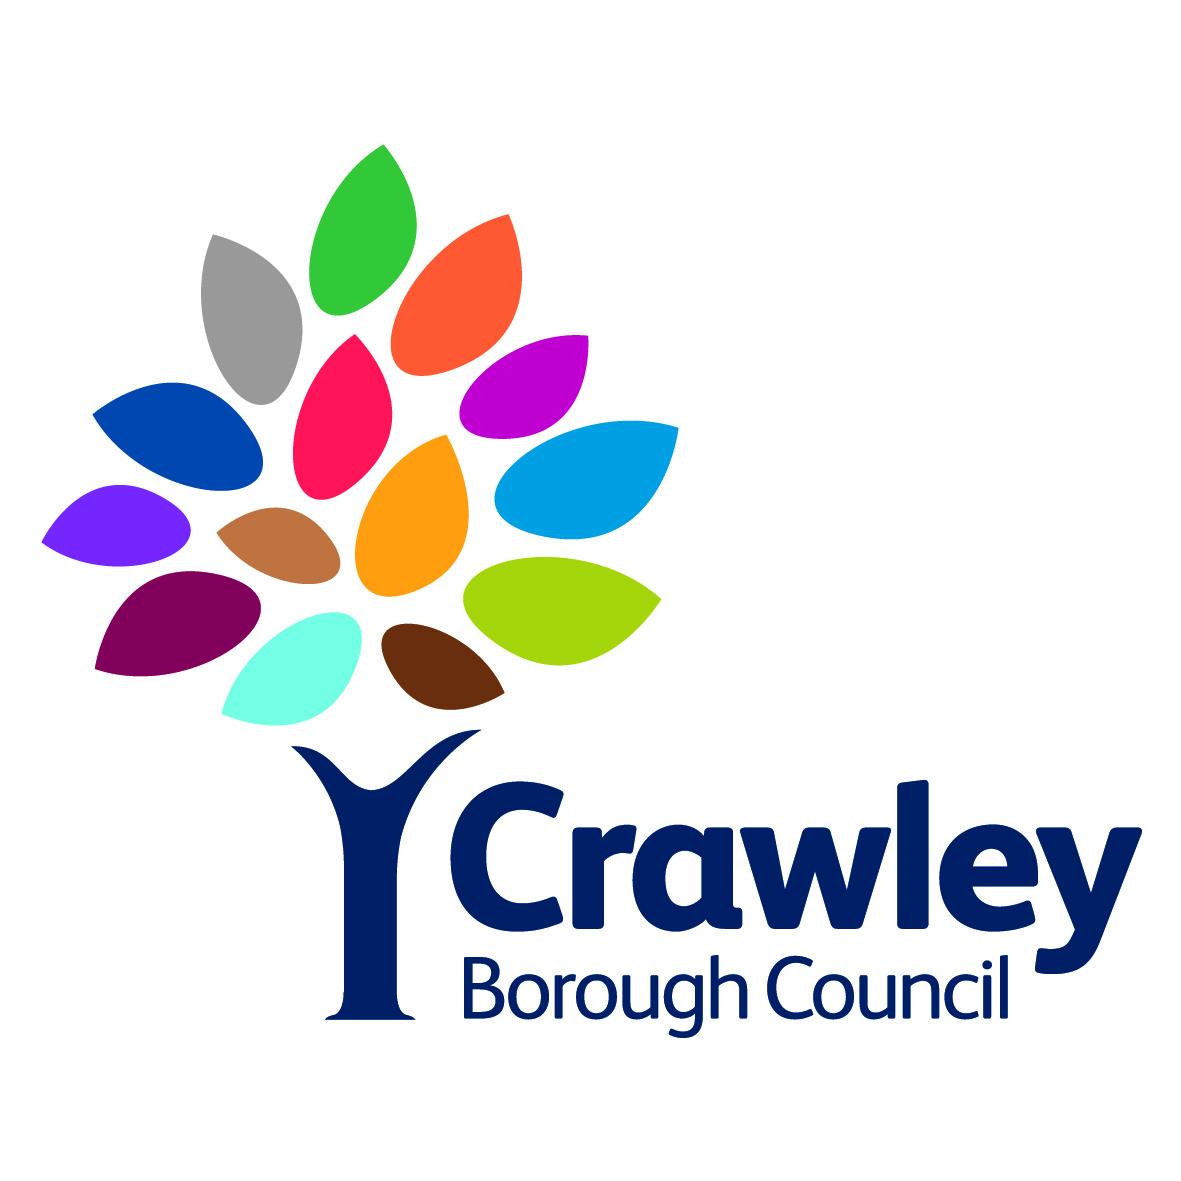 crawley_bc_logo_cmyk_002_1181_01